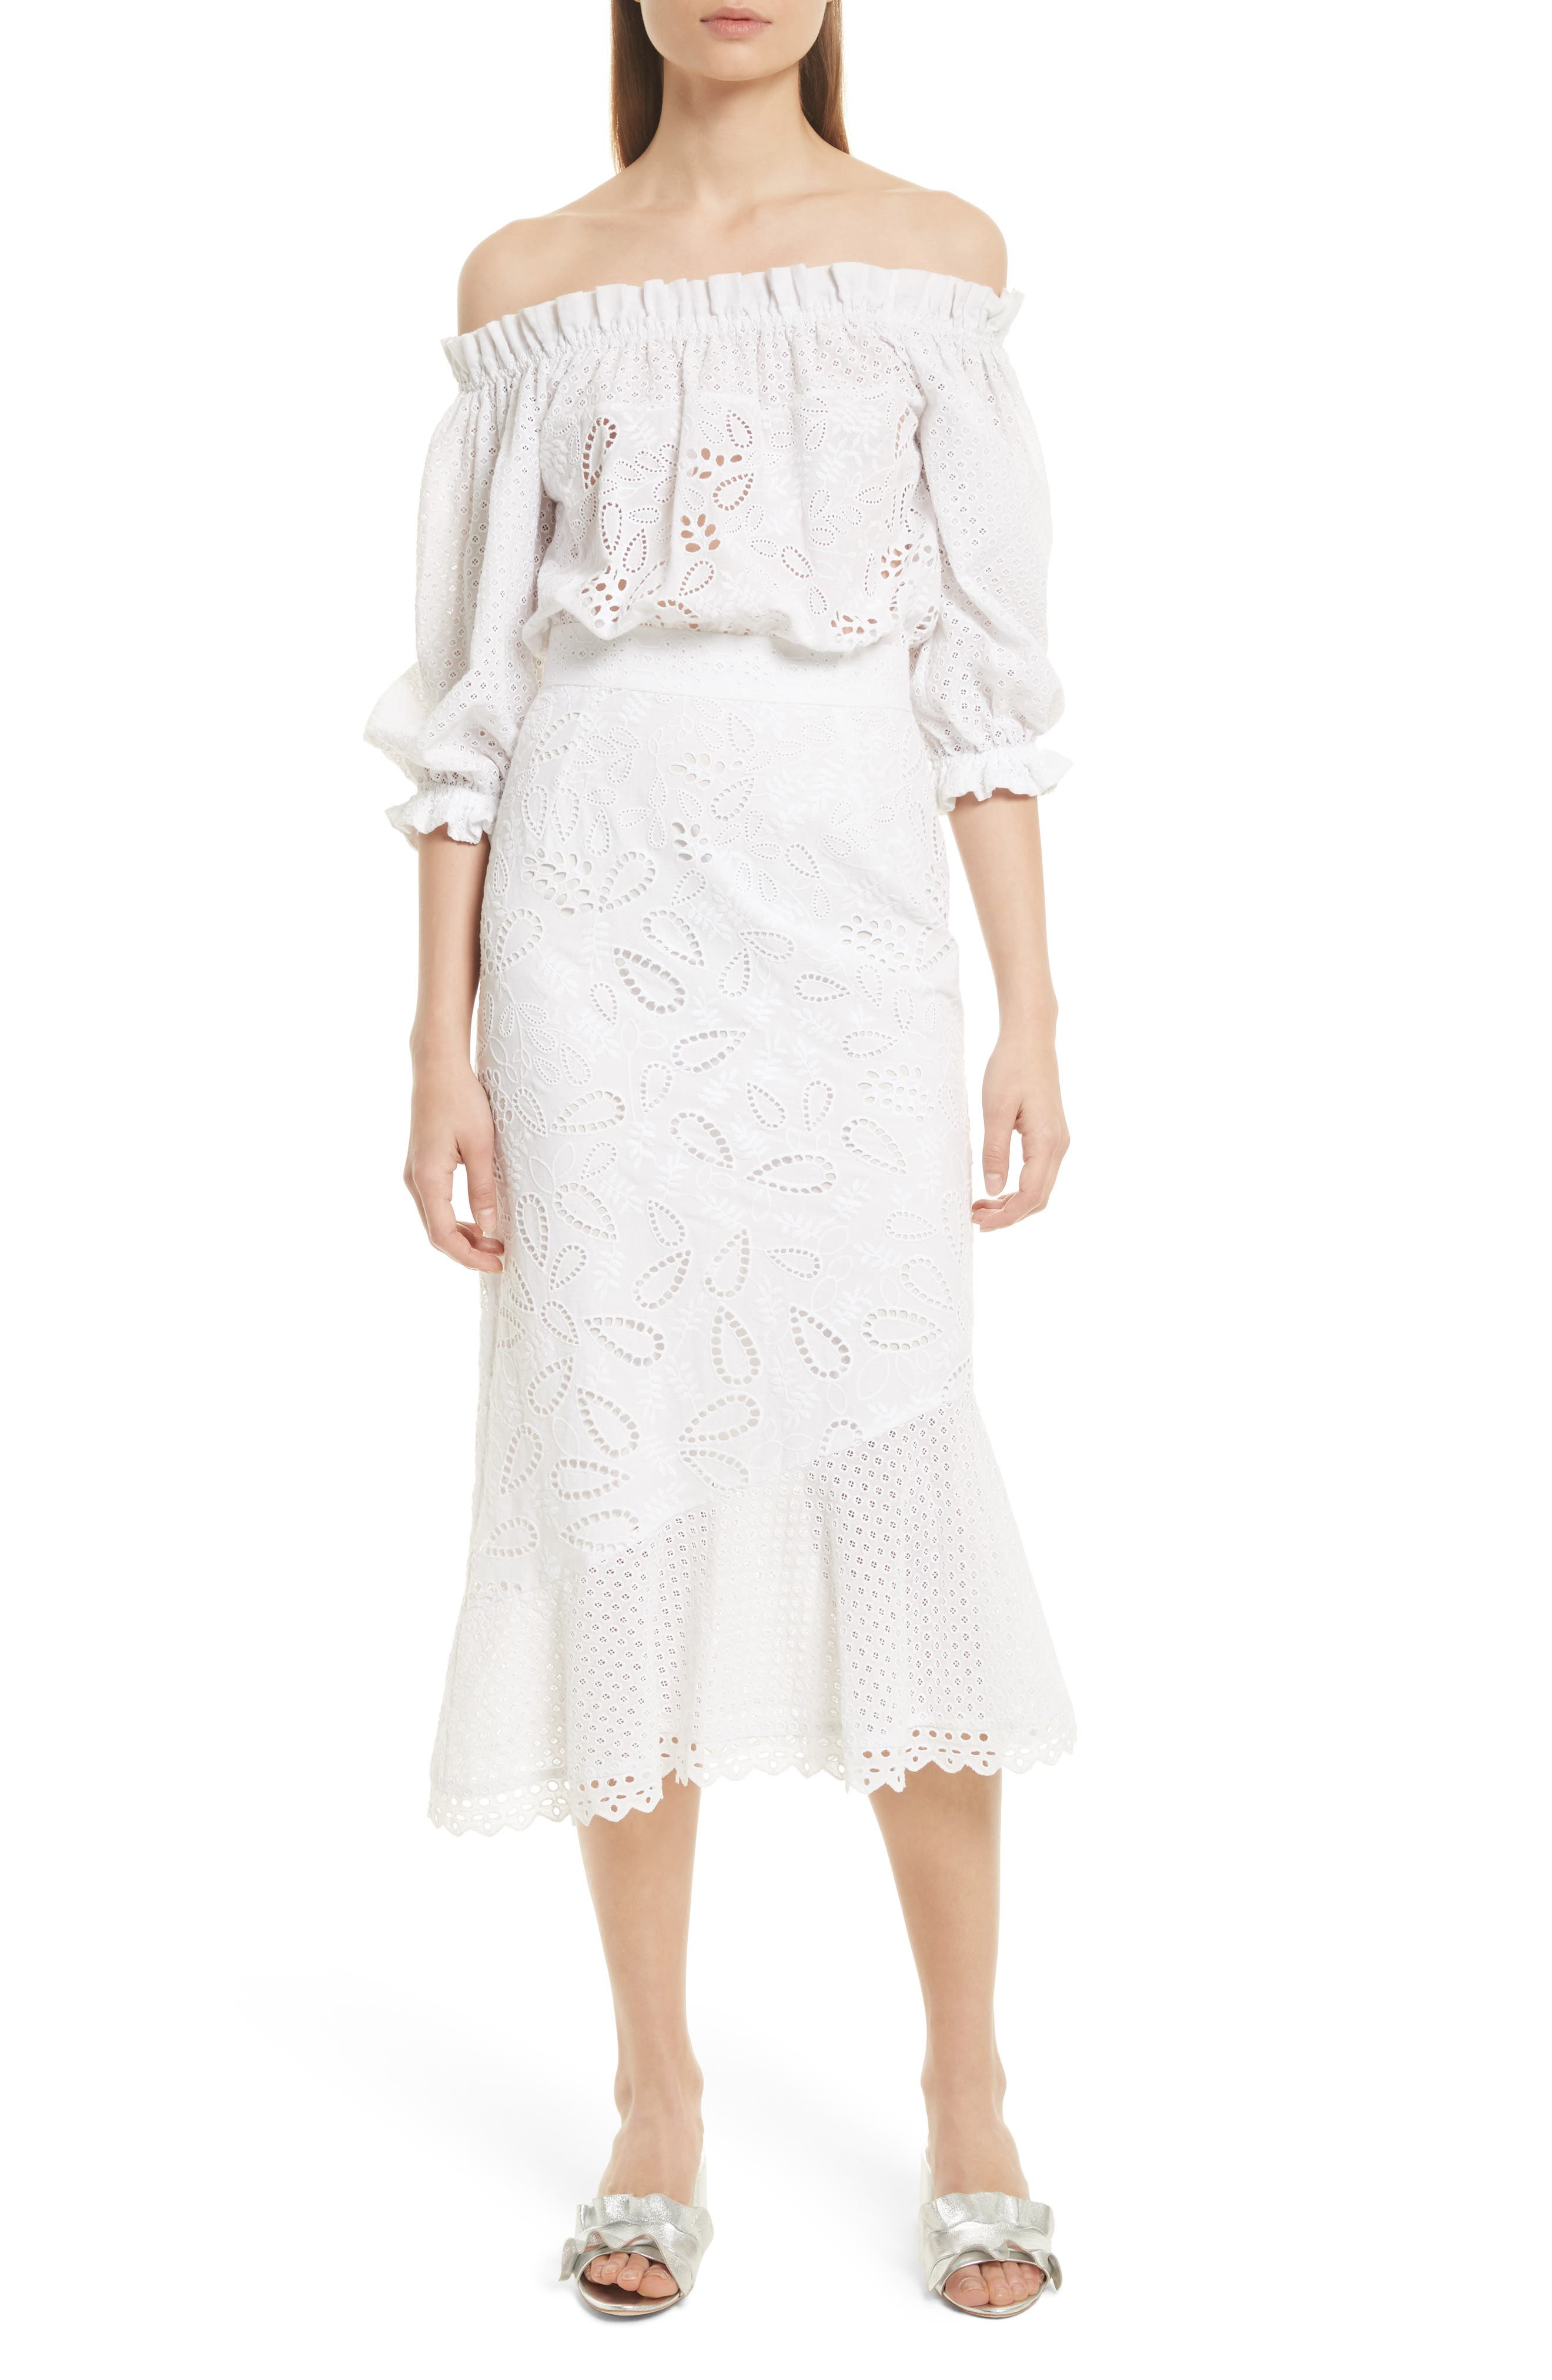 Grace Cotton Off the Shoulder Dress,                         Main,                         color, White/ French Lace